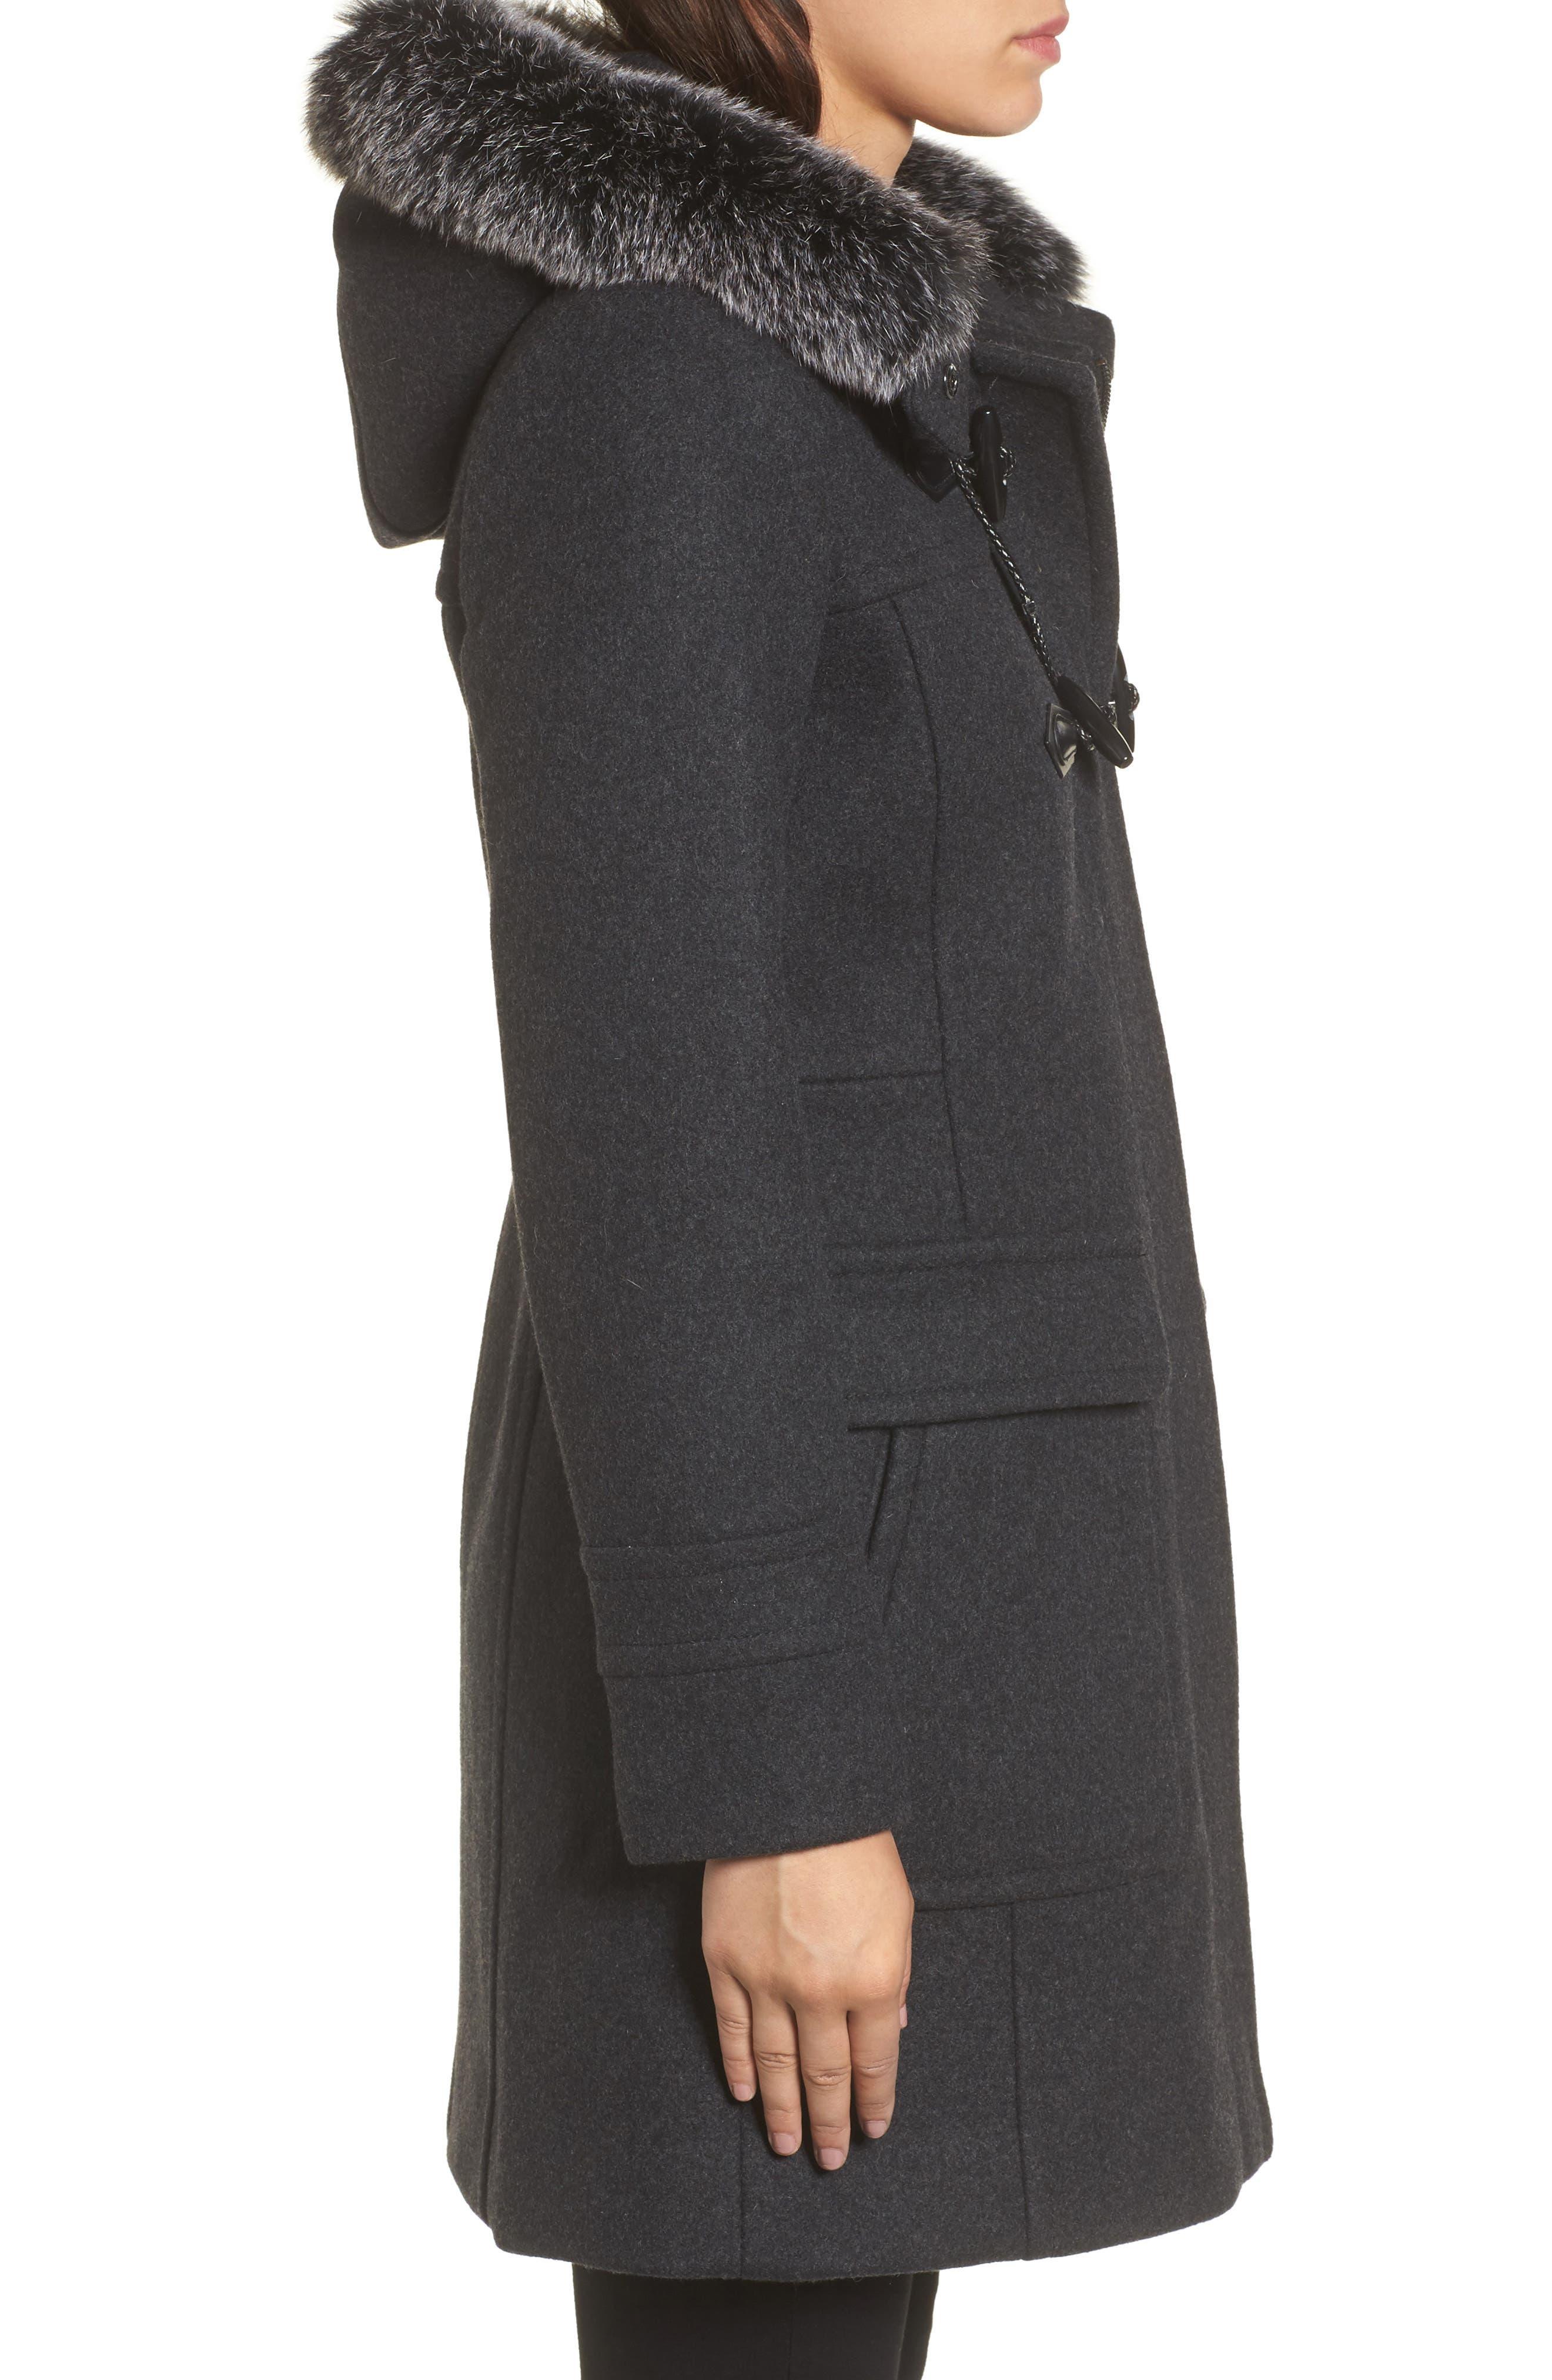 Alternate Image 3  - Trina Turk Connie Duffle Coat with Genuine Fox Fur